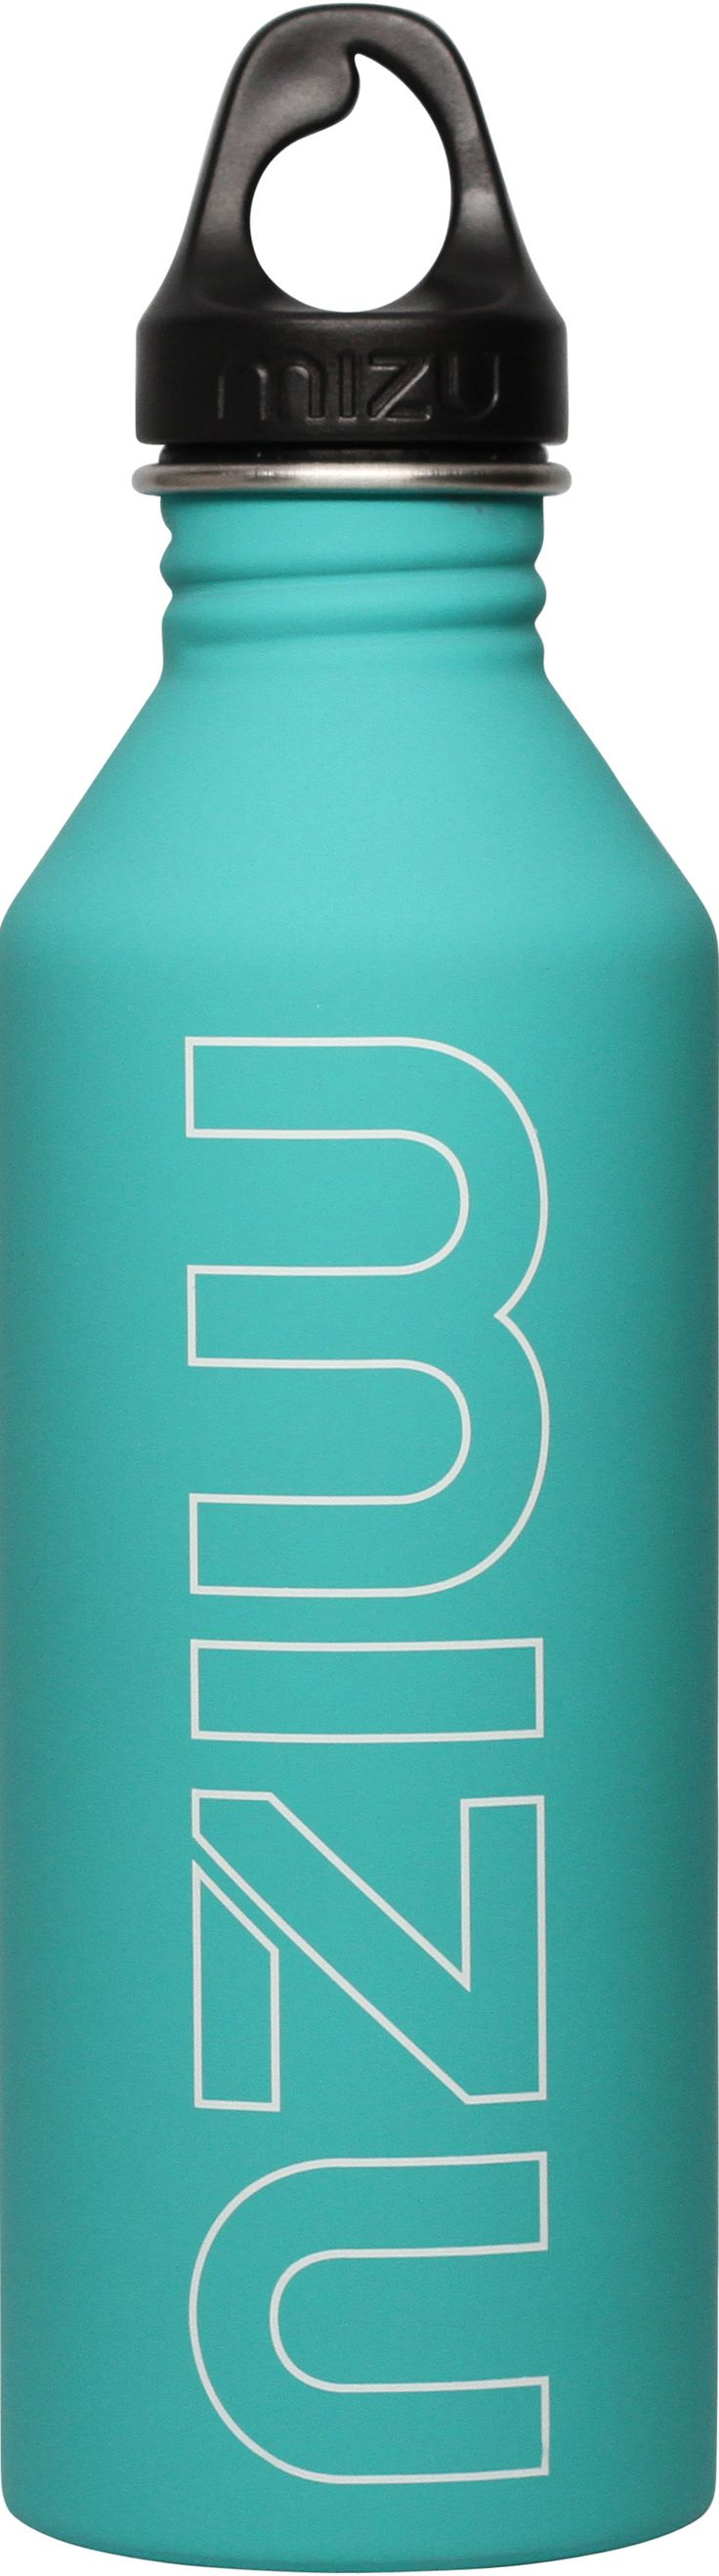 Mizu bottle mint